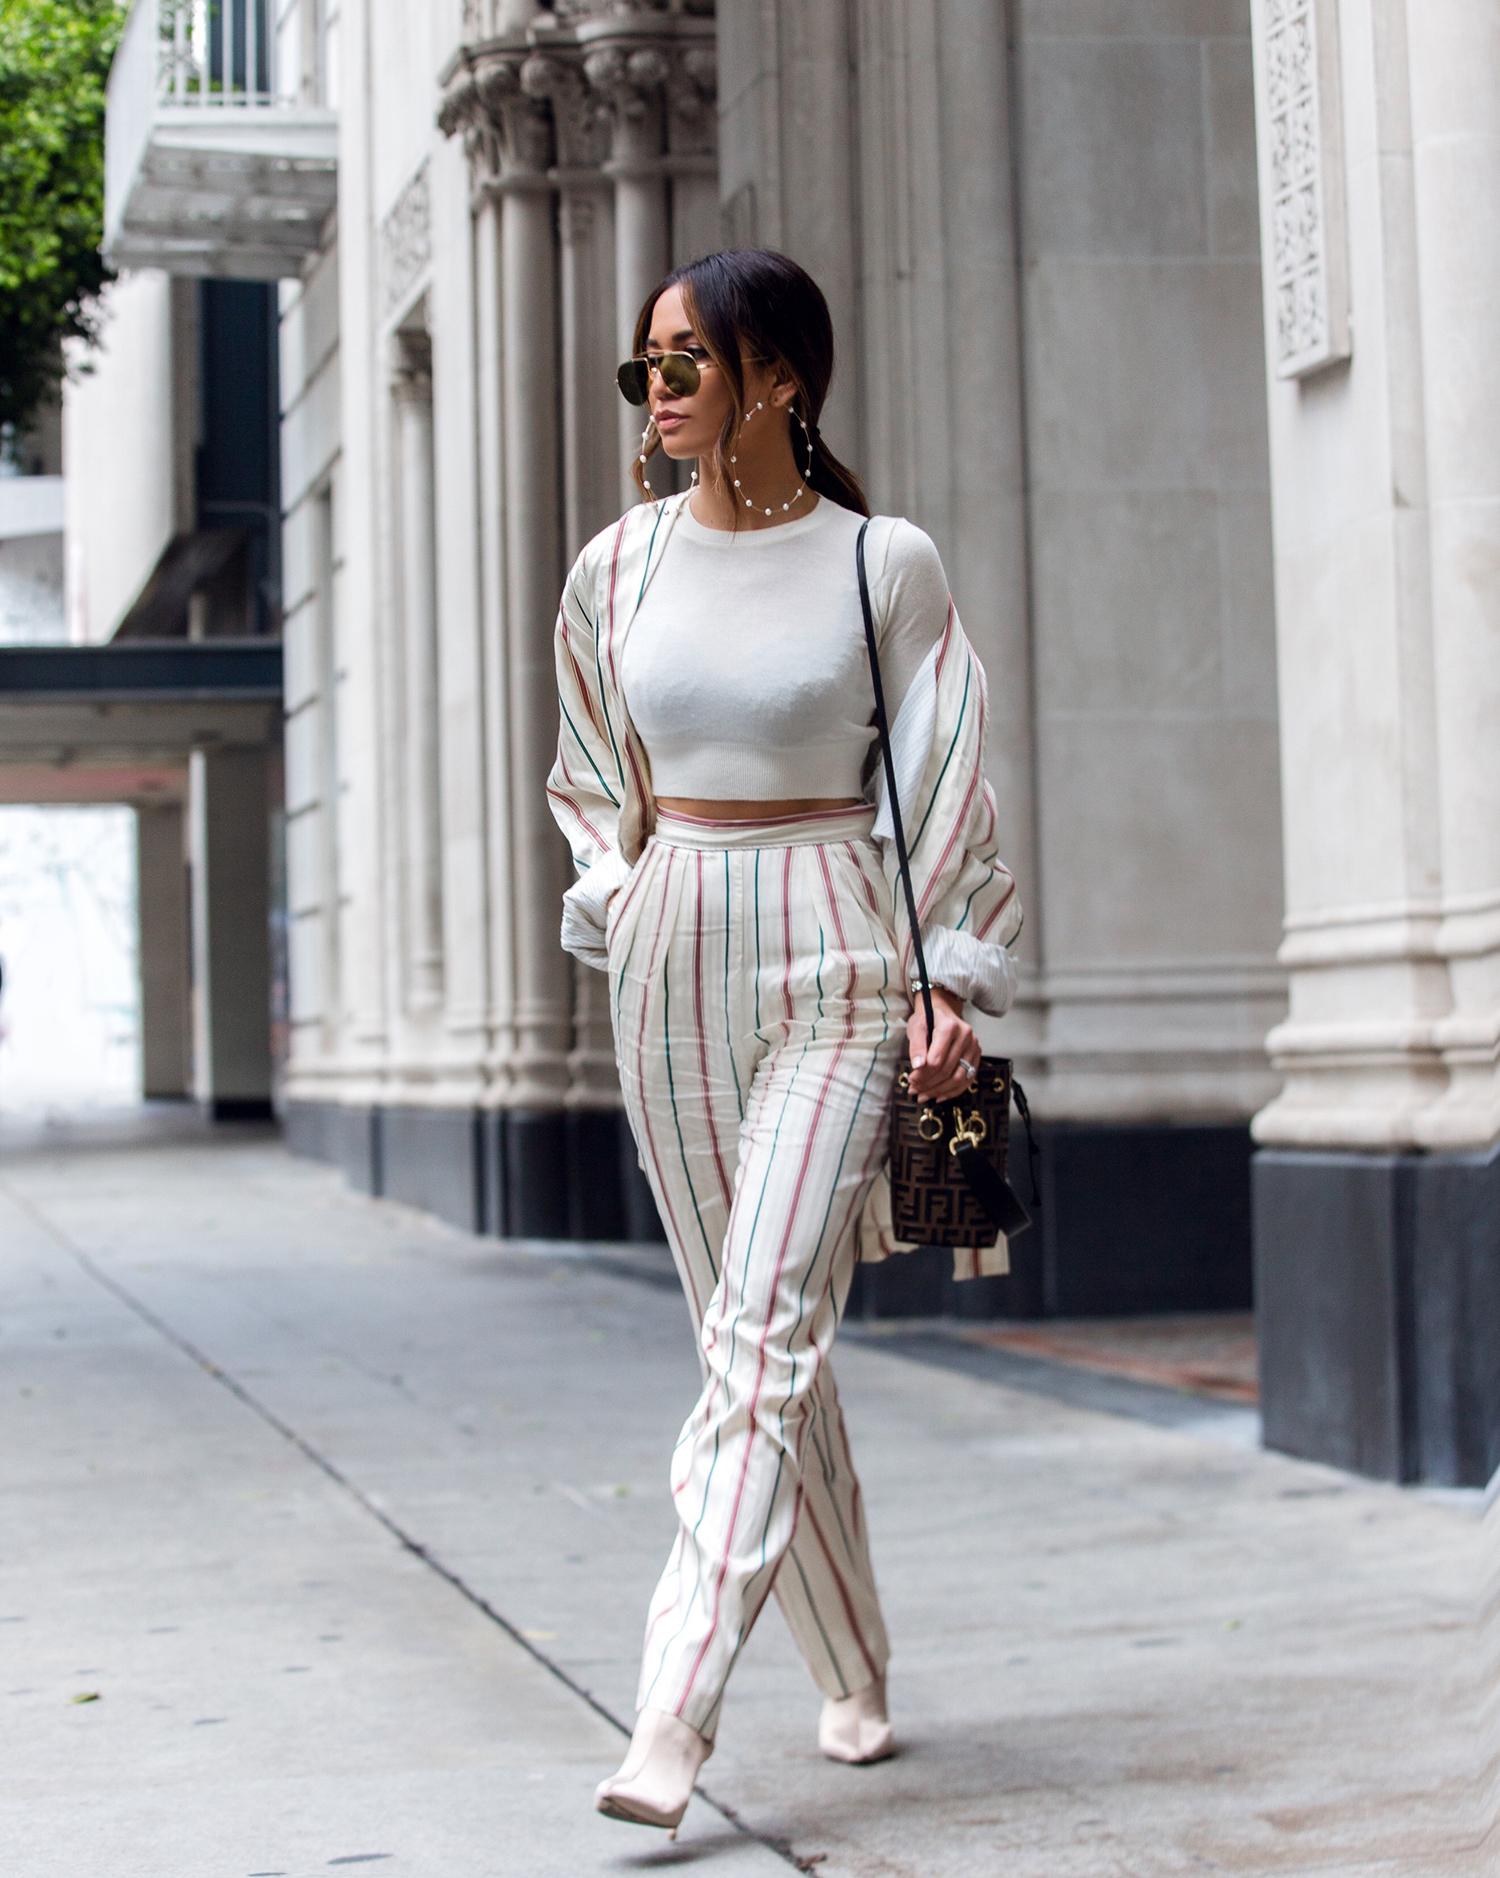 Jessi Malay wearing pinstripe suit trend